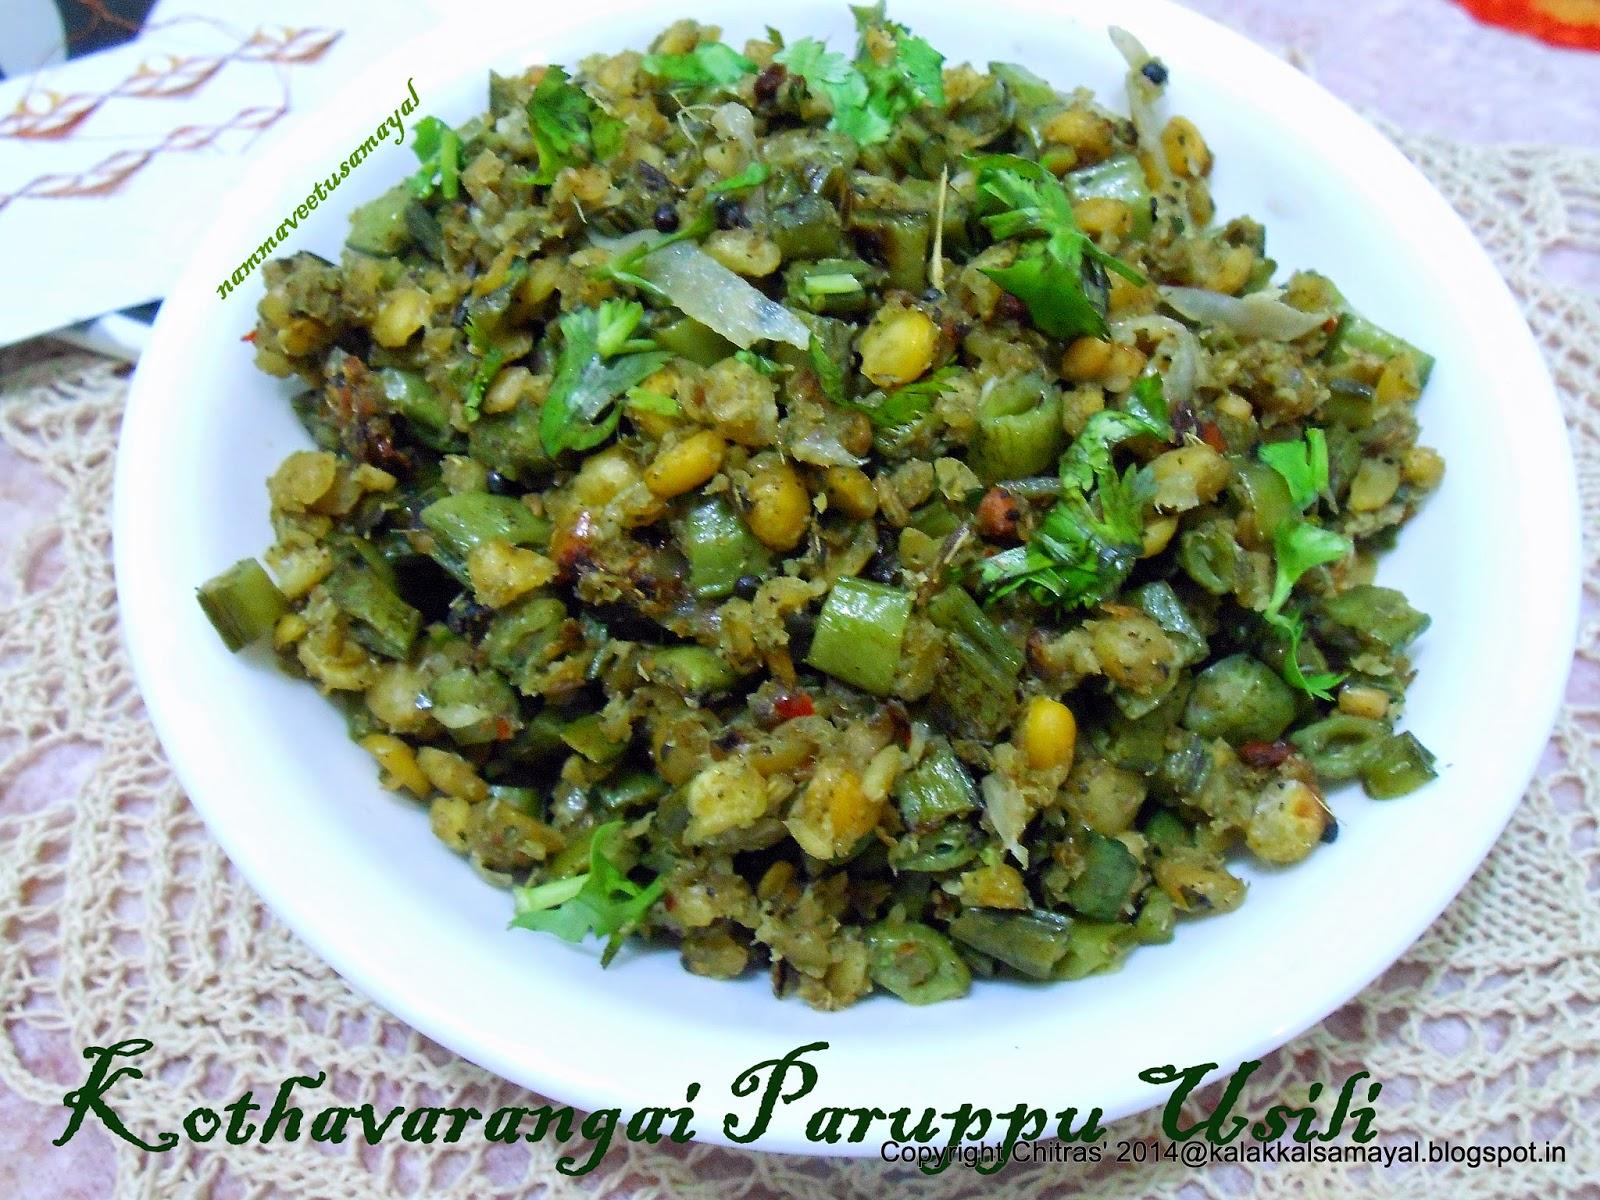 Kothavarangai Paruppu Usili [ Cluster Beans Lentil Masala Curry ]